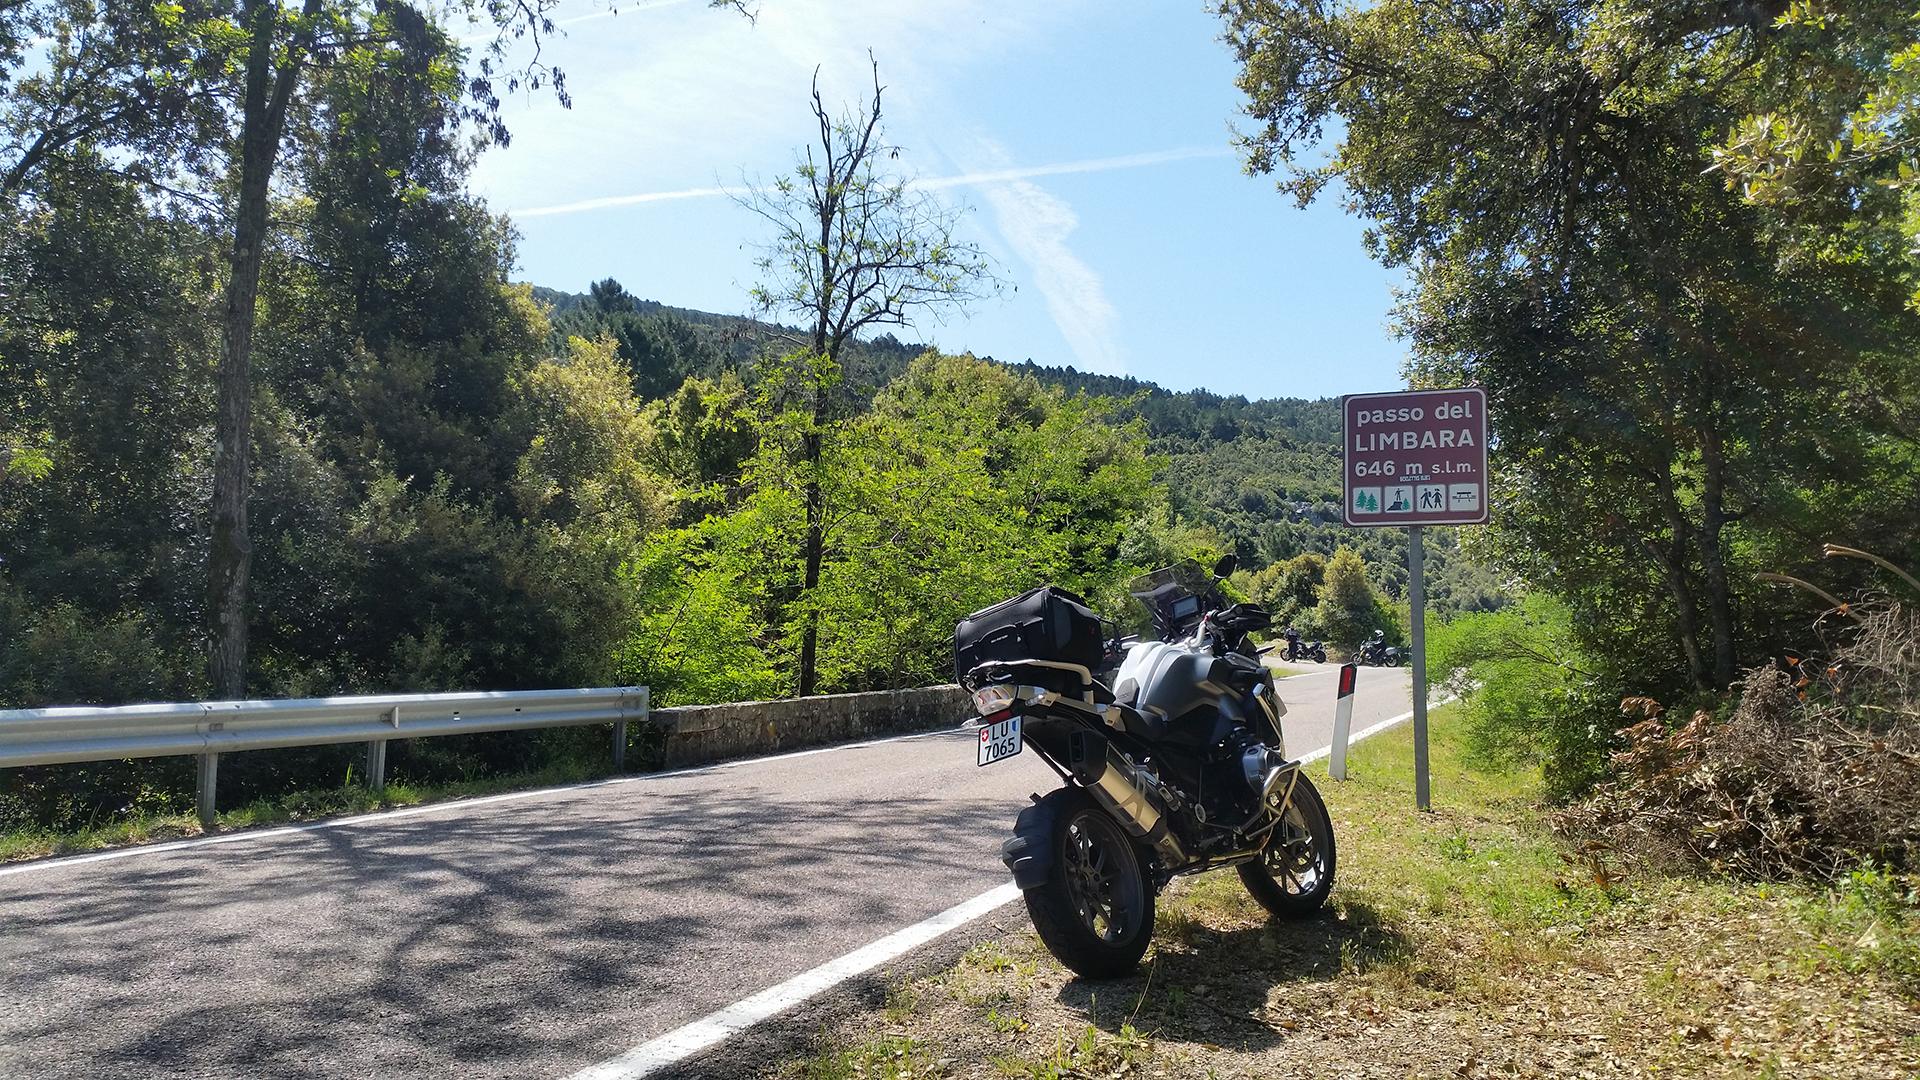 0646 - I (Sardegna) - Passo del Limbara